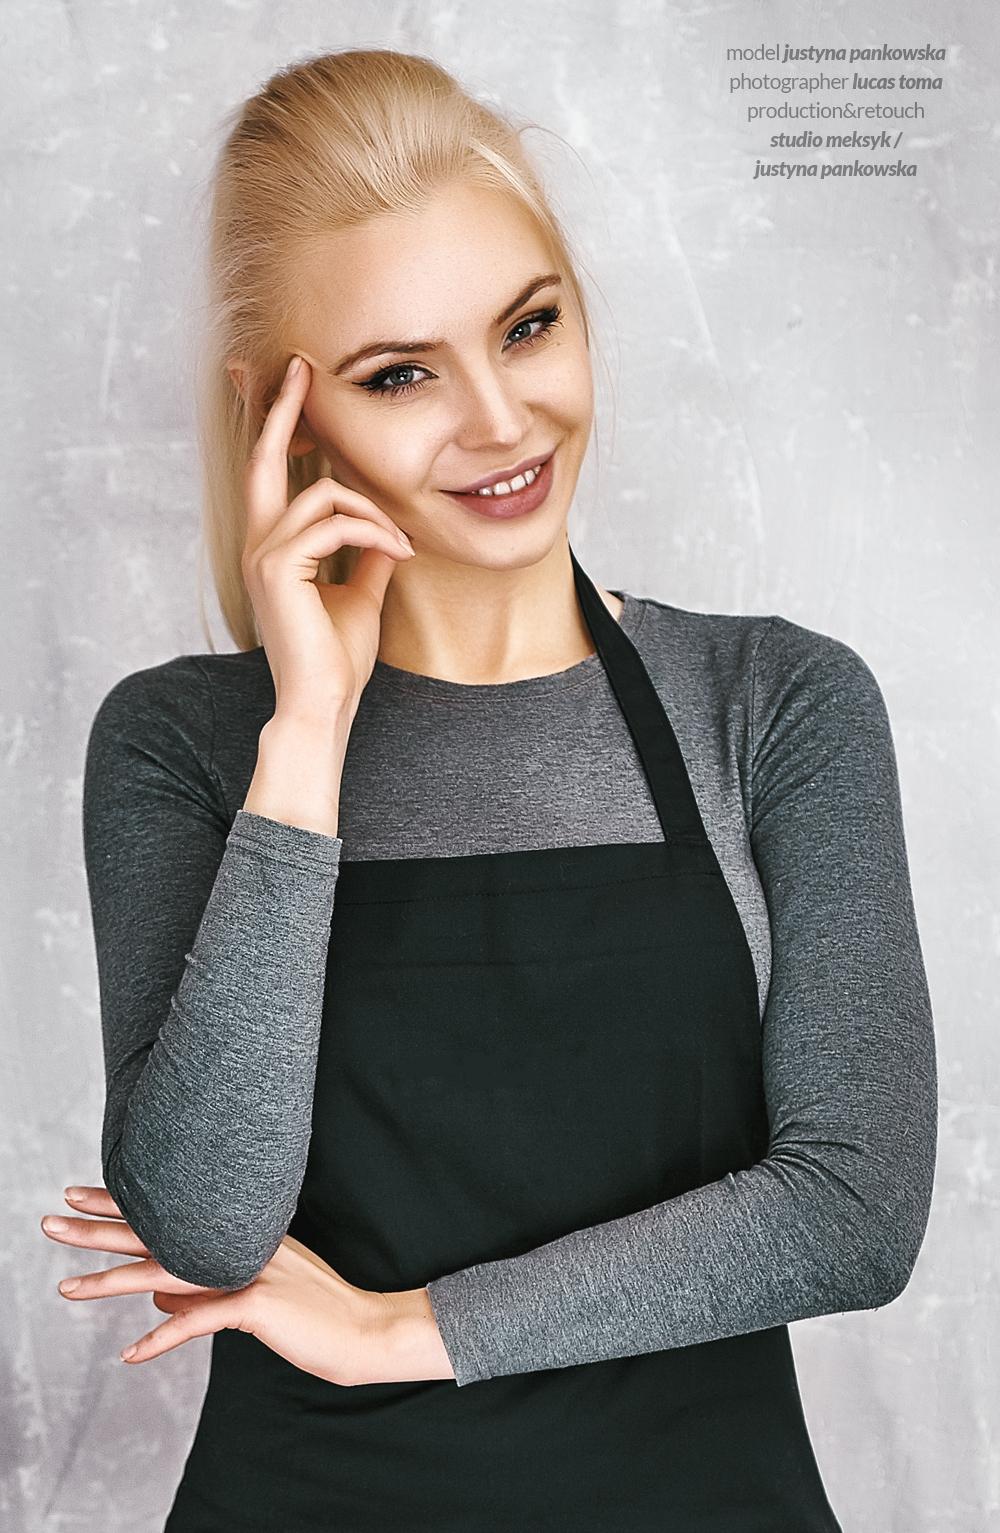 Justyna Pankowska, portrait, retouch, smile, gastro, bloger, food, photography, photographer, stylist, eatami, eat, girl, breakfast, tasty, power, love food, 1 . jpg.jpg